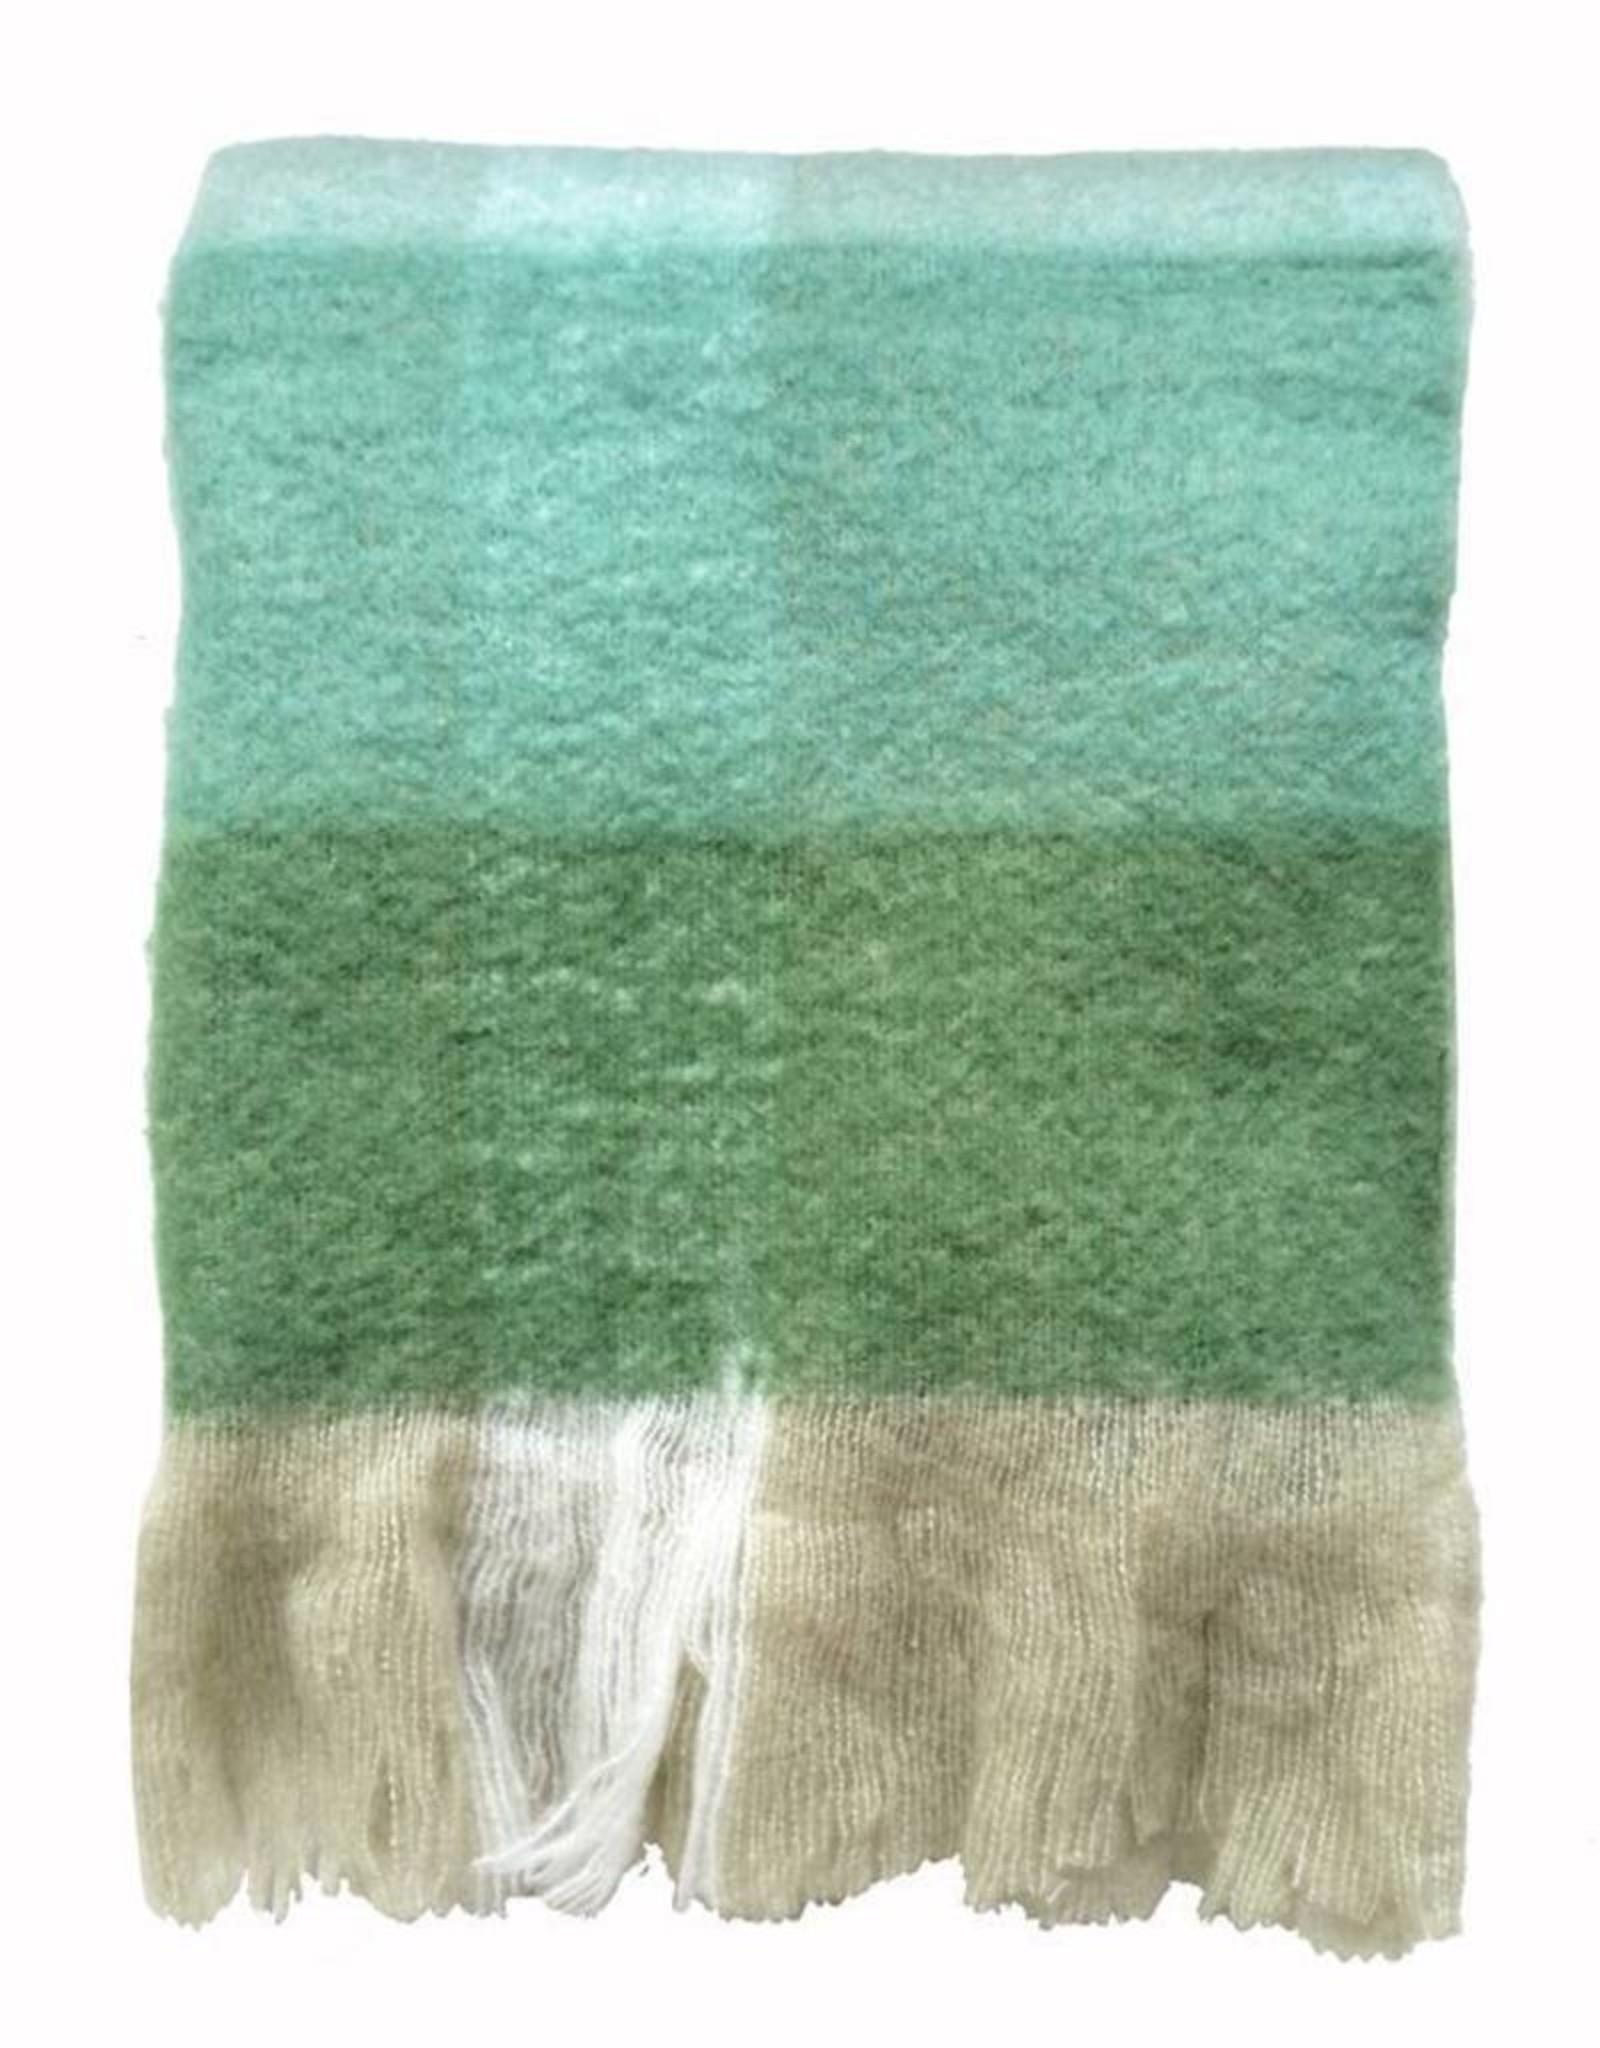 Plaid Soft Pea Green